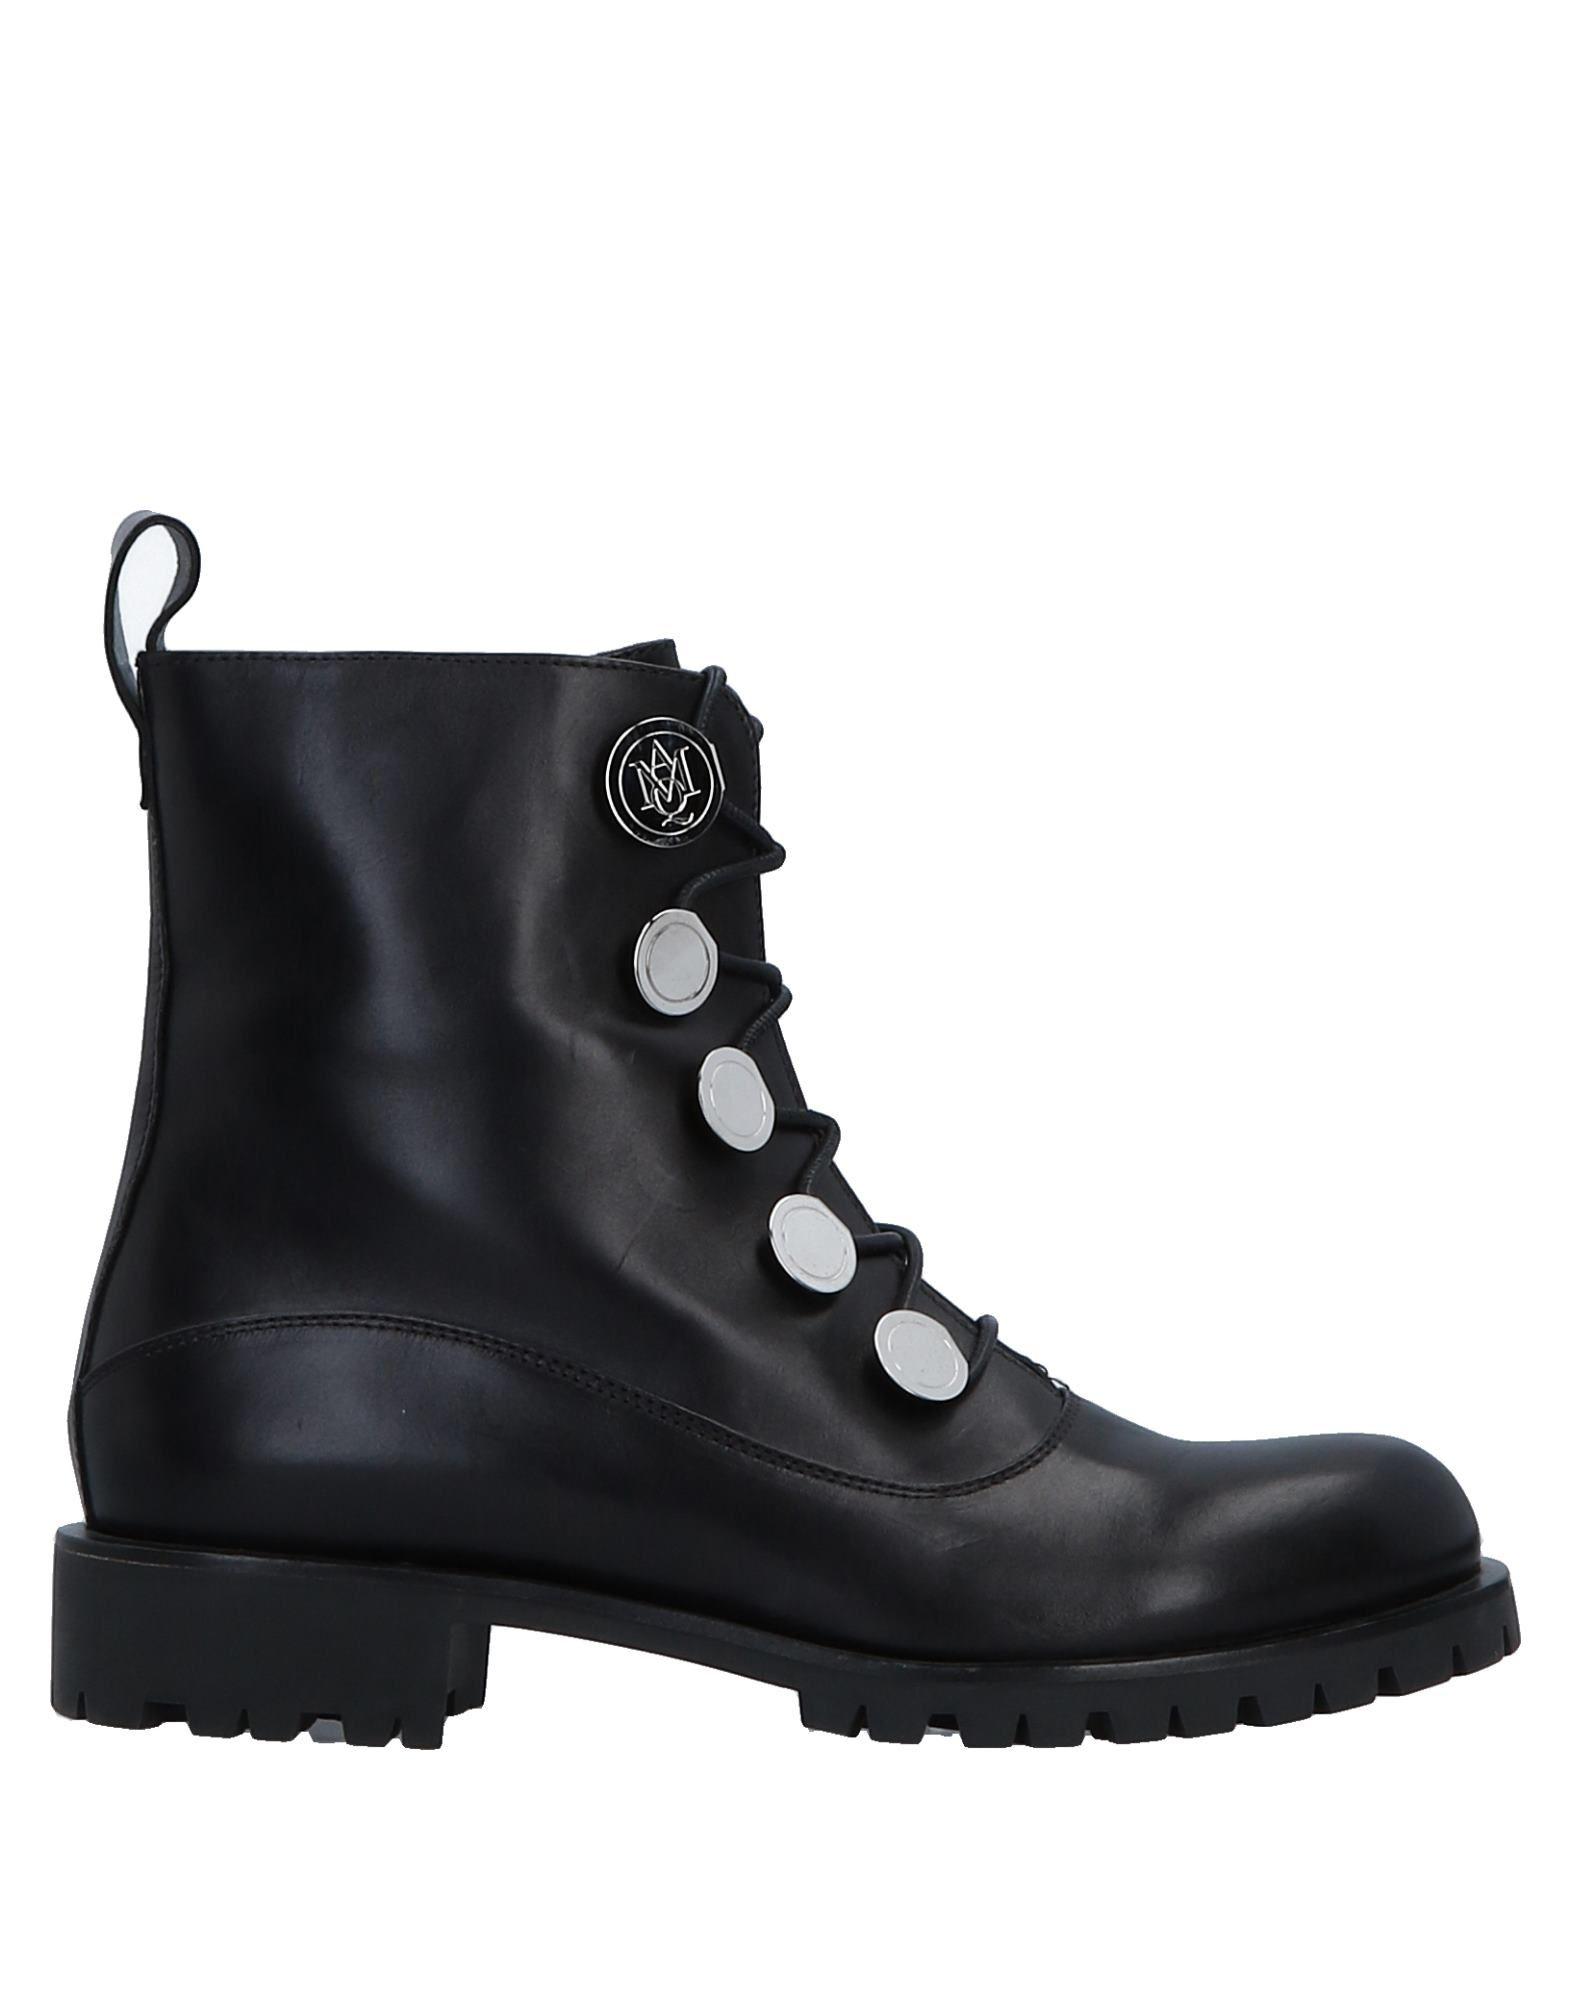 Alexander Mcqueen Ankle Boot - Women Alexander Mcqueen Ankle Australia Boots online on  Australia Ankle - 11434151PE 28fea4